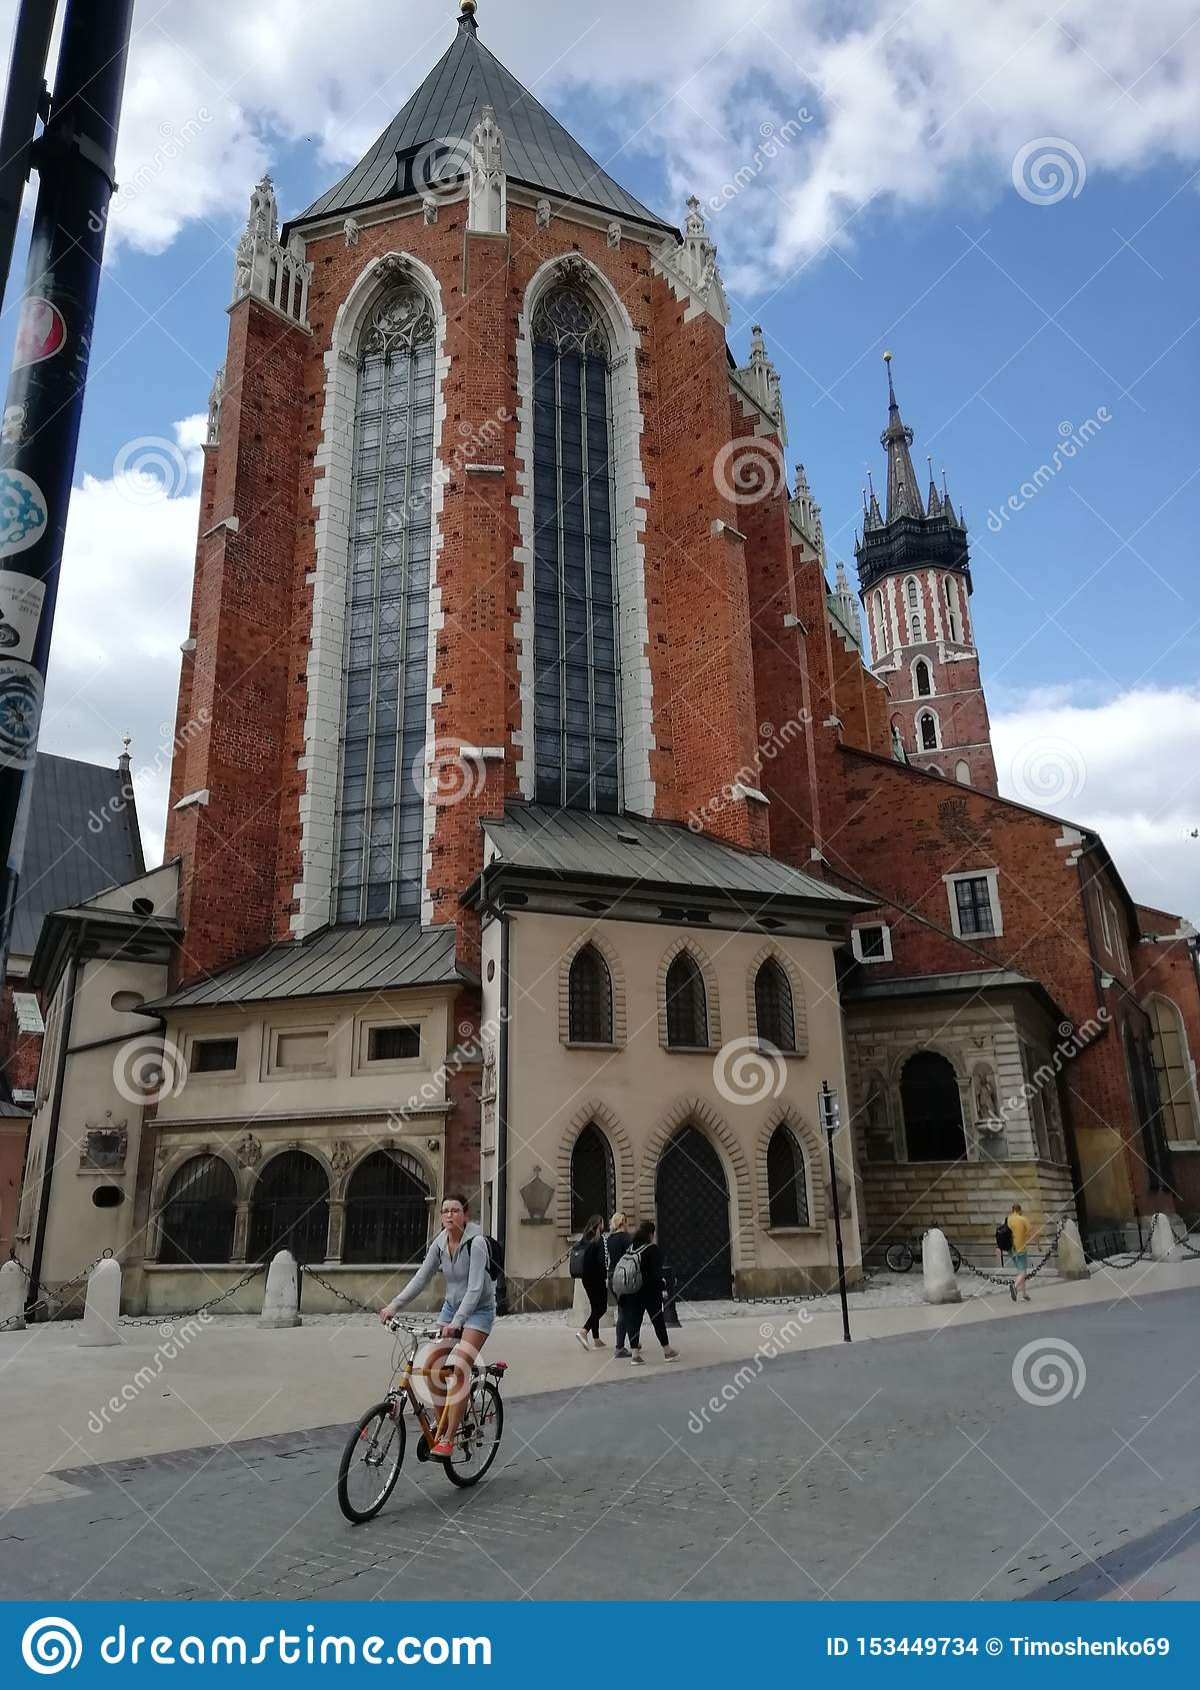 The majestic church of Krakow